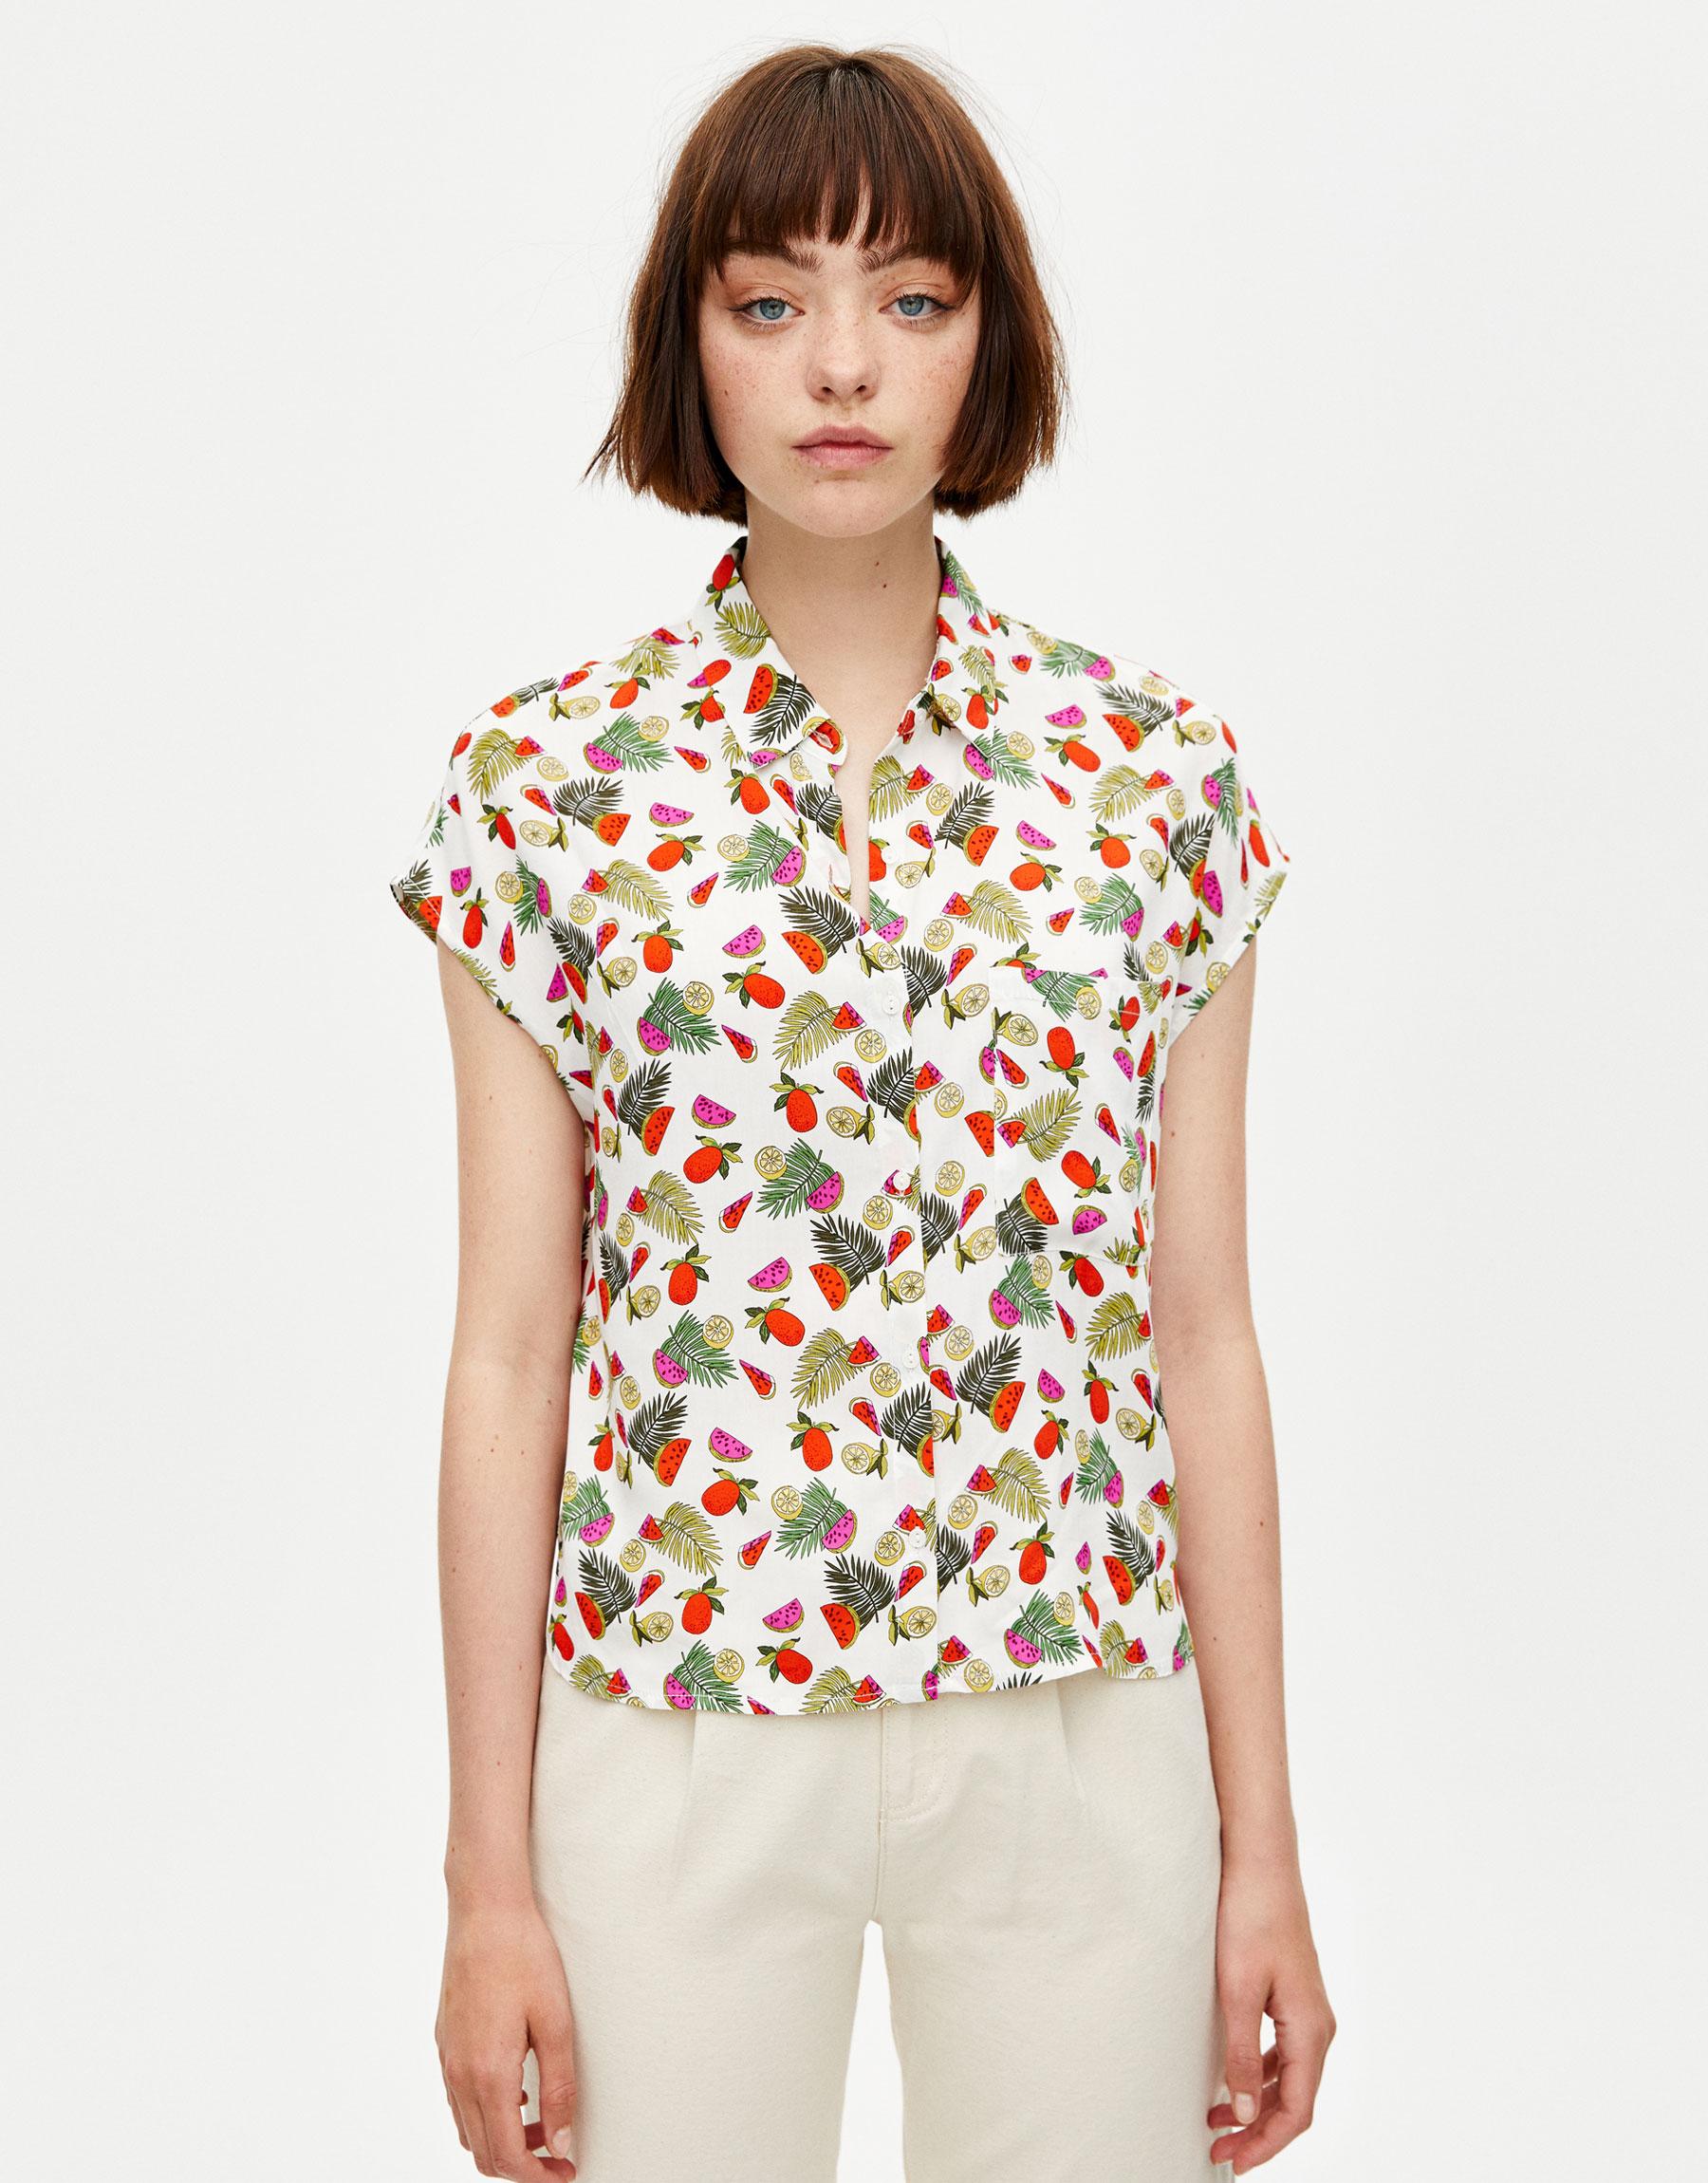 740fb5f1a3b2 Pullbear Printed sleeveless shirt 1 Pullbear Printed sleeveless shirt 3 ...